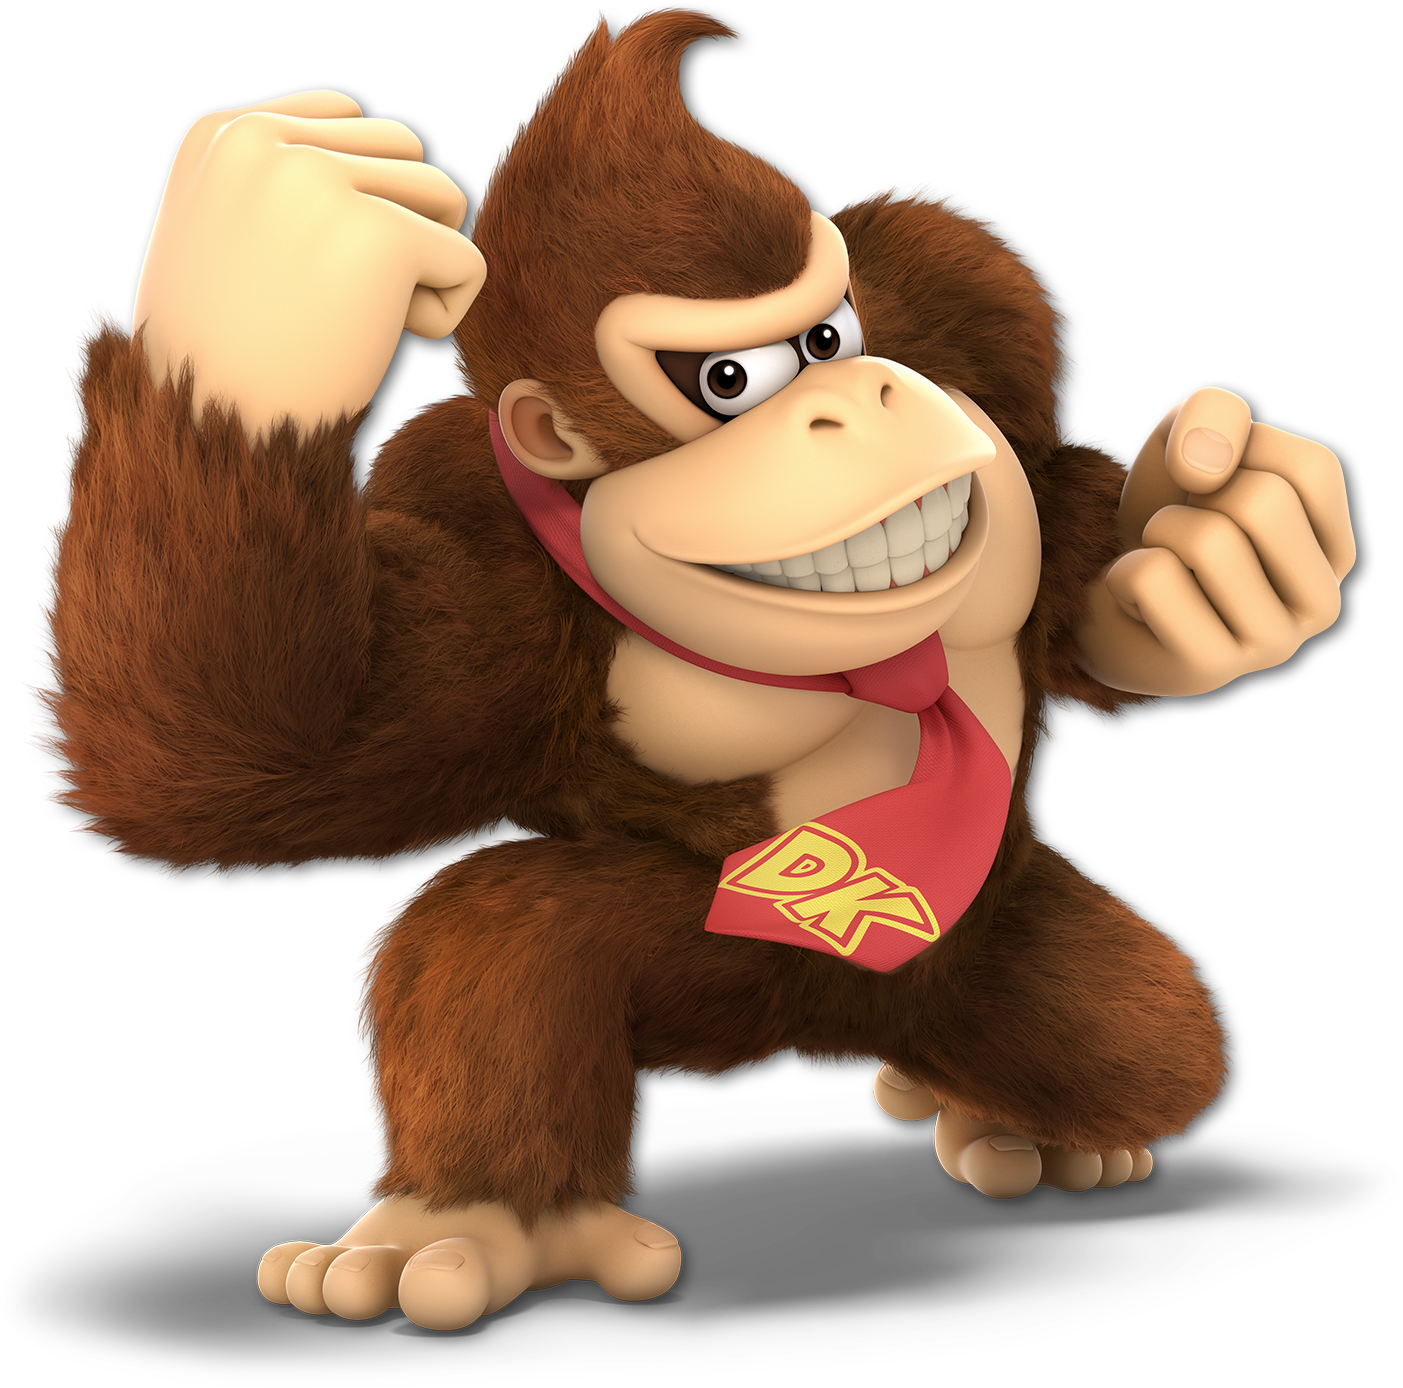 Donkey Kong (Character) | VS Battles Wiki | FANDOM powered by Wikia